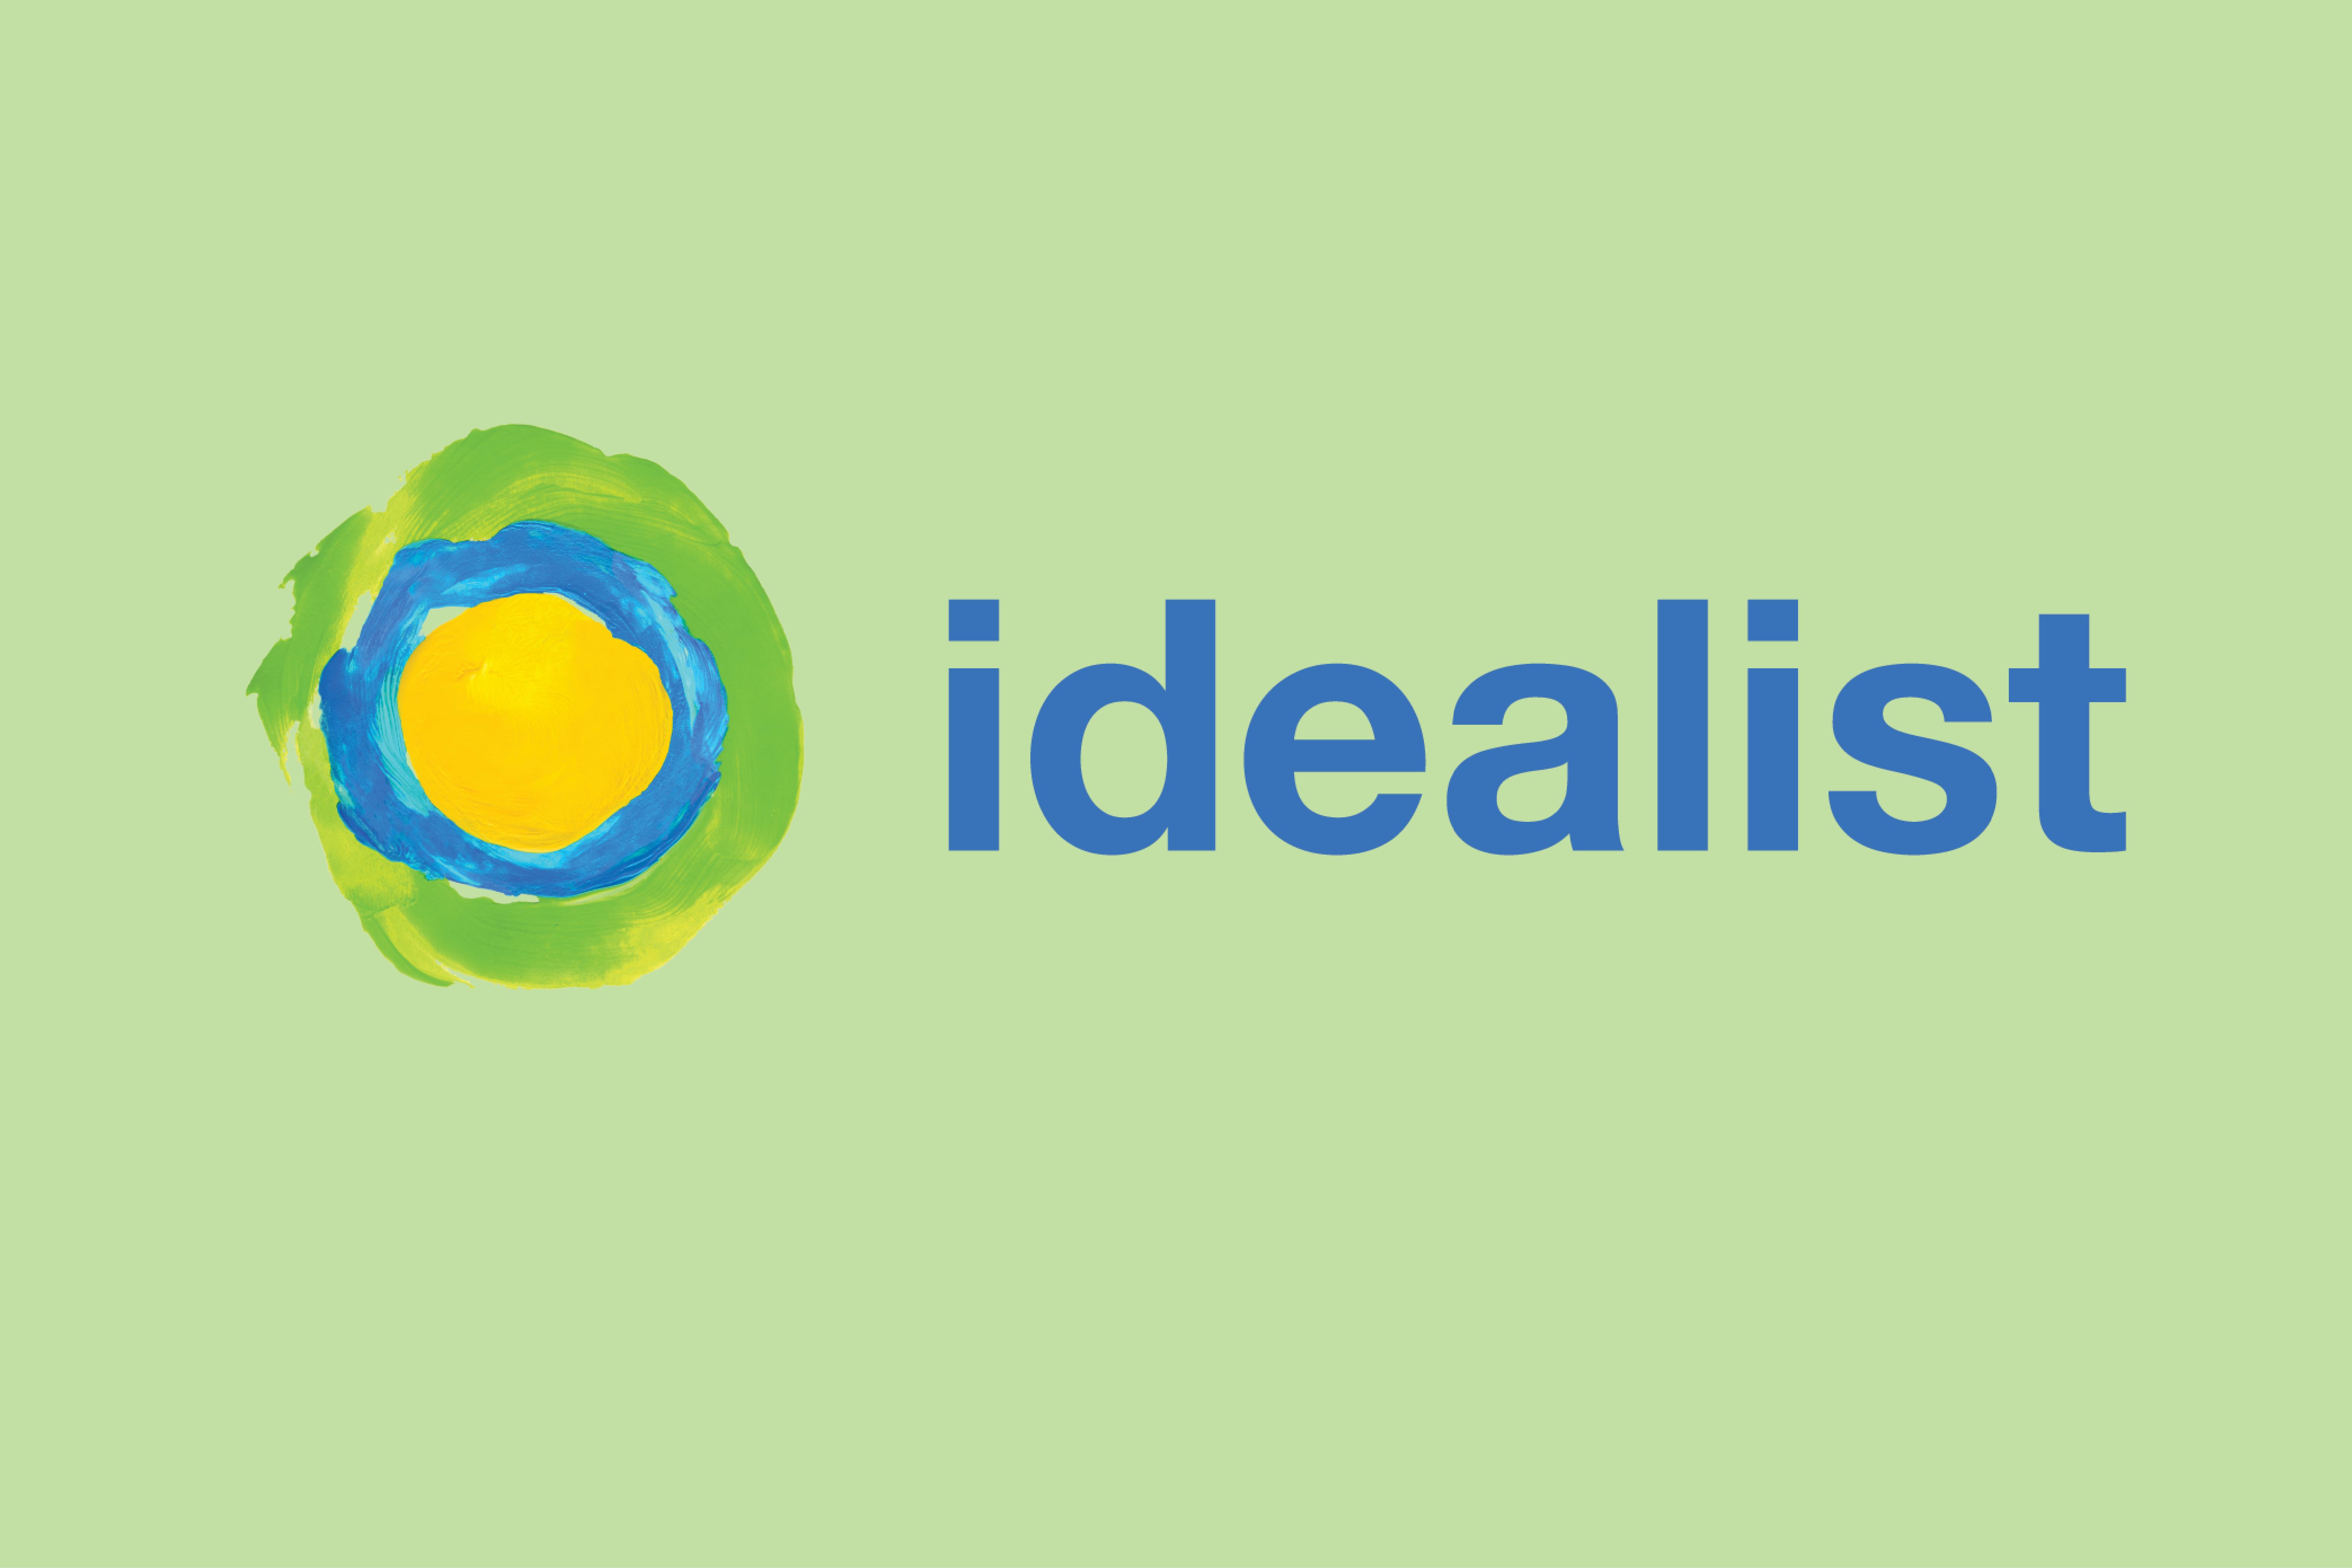 Idealist link